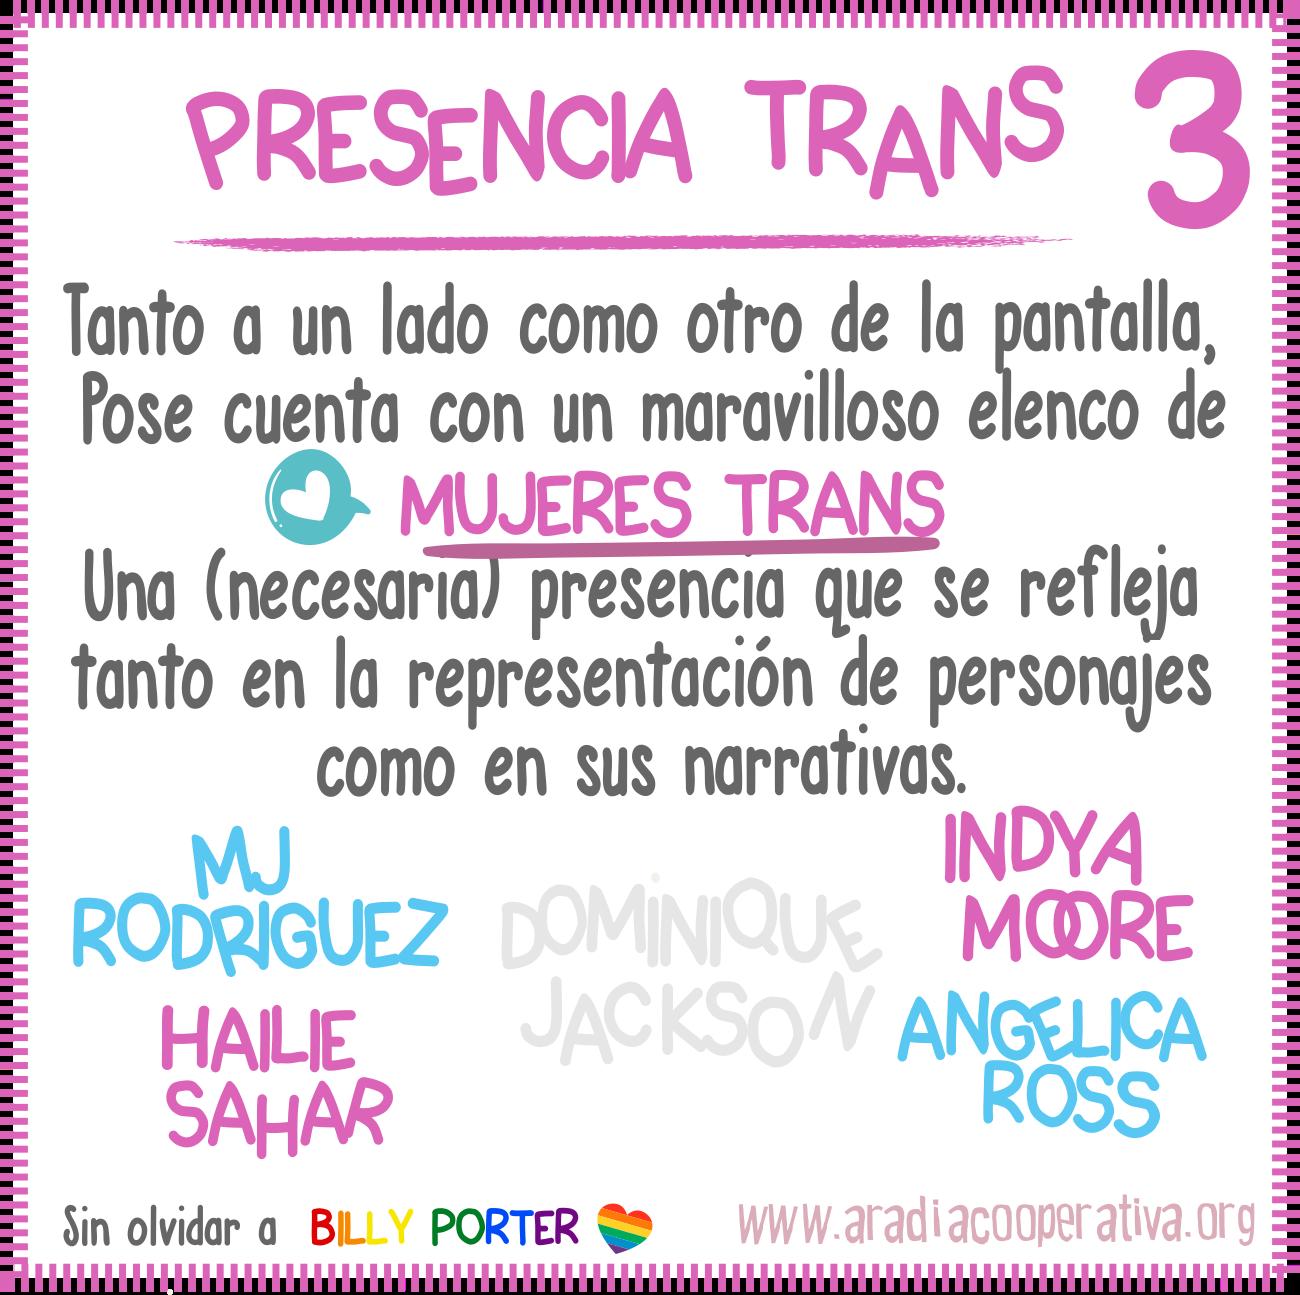 Presencia trans